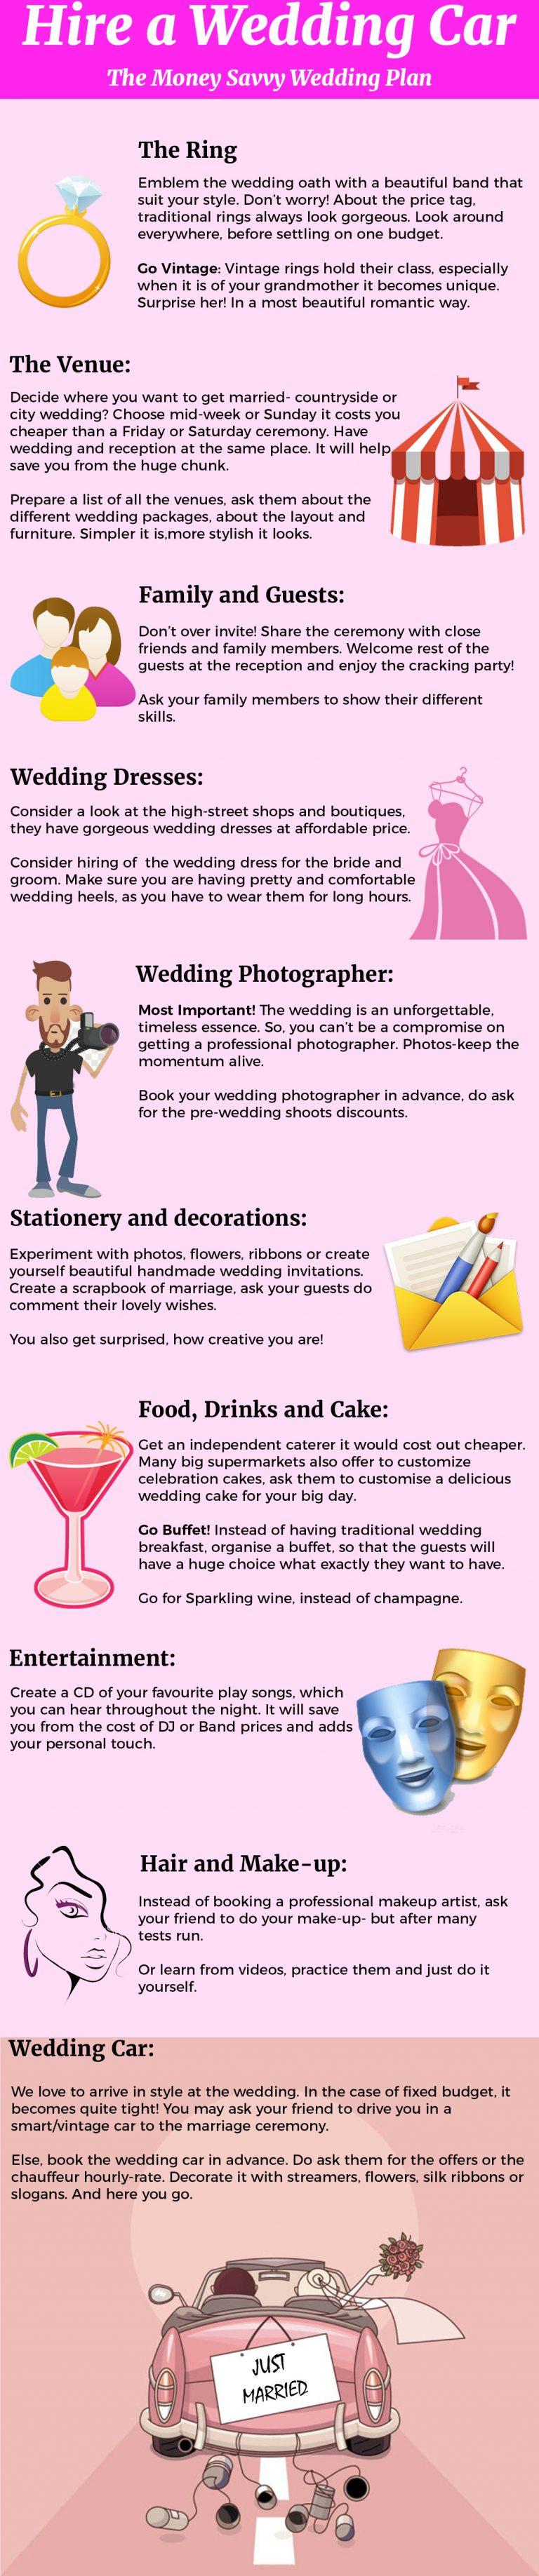 The Money Savvy Wedding Plan [Infographic]